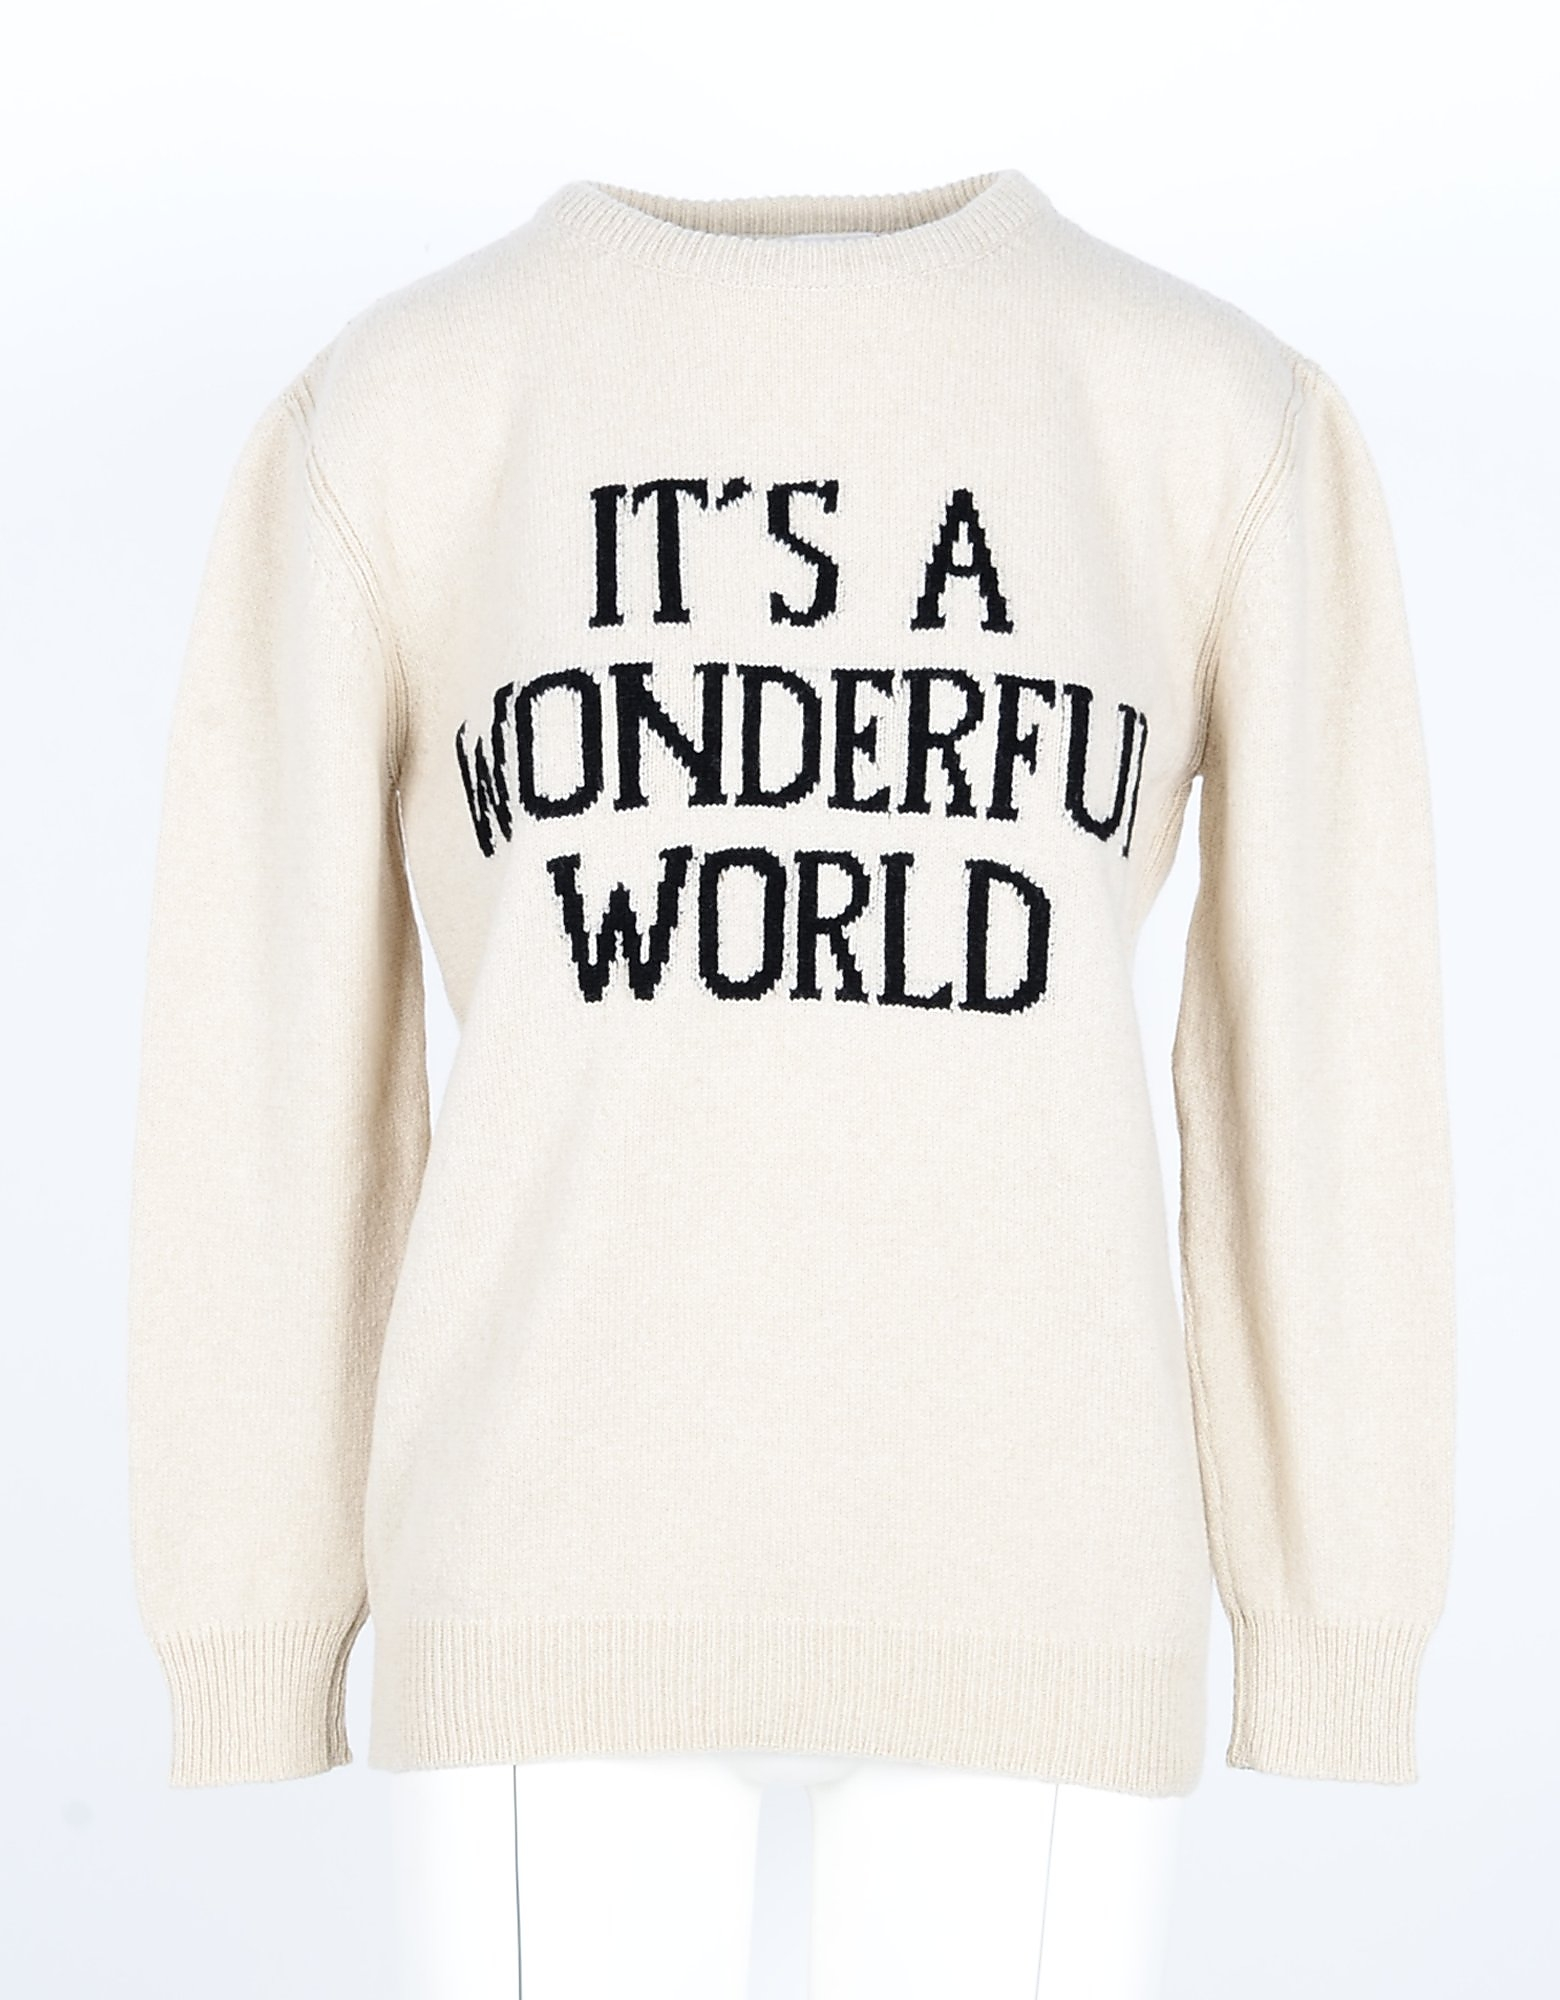 Alberta Ferretti Designer Knitwear, Cashmere Blend Women's Sweater